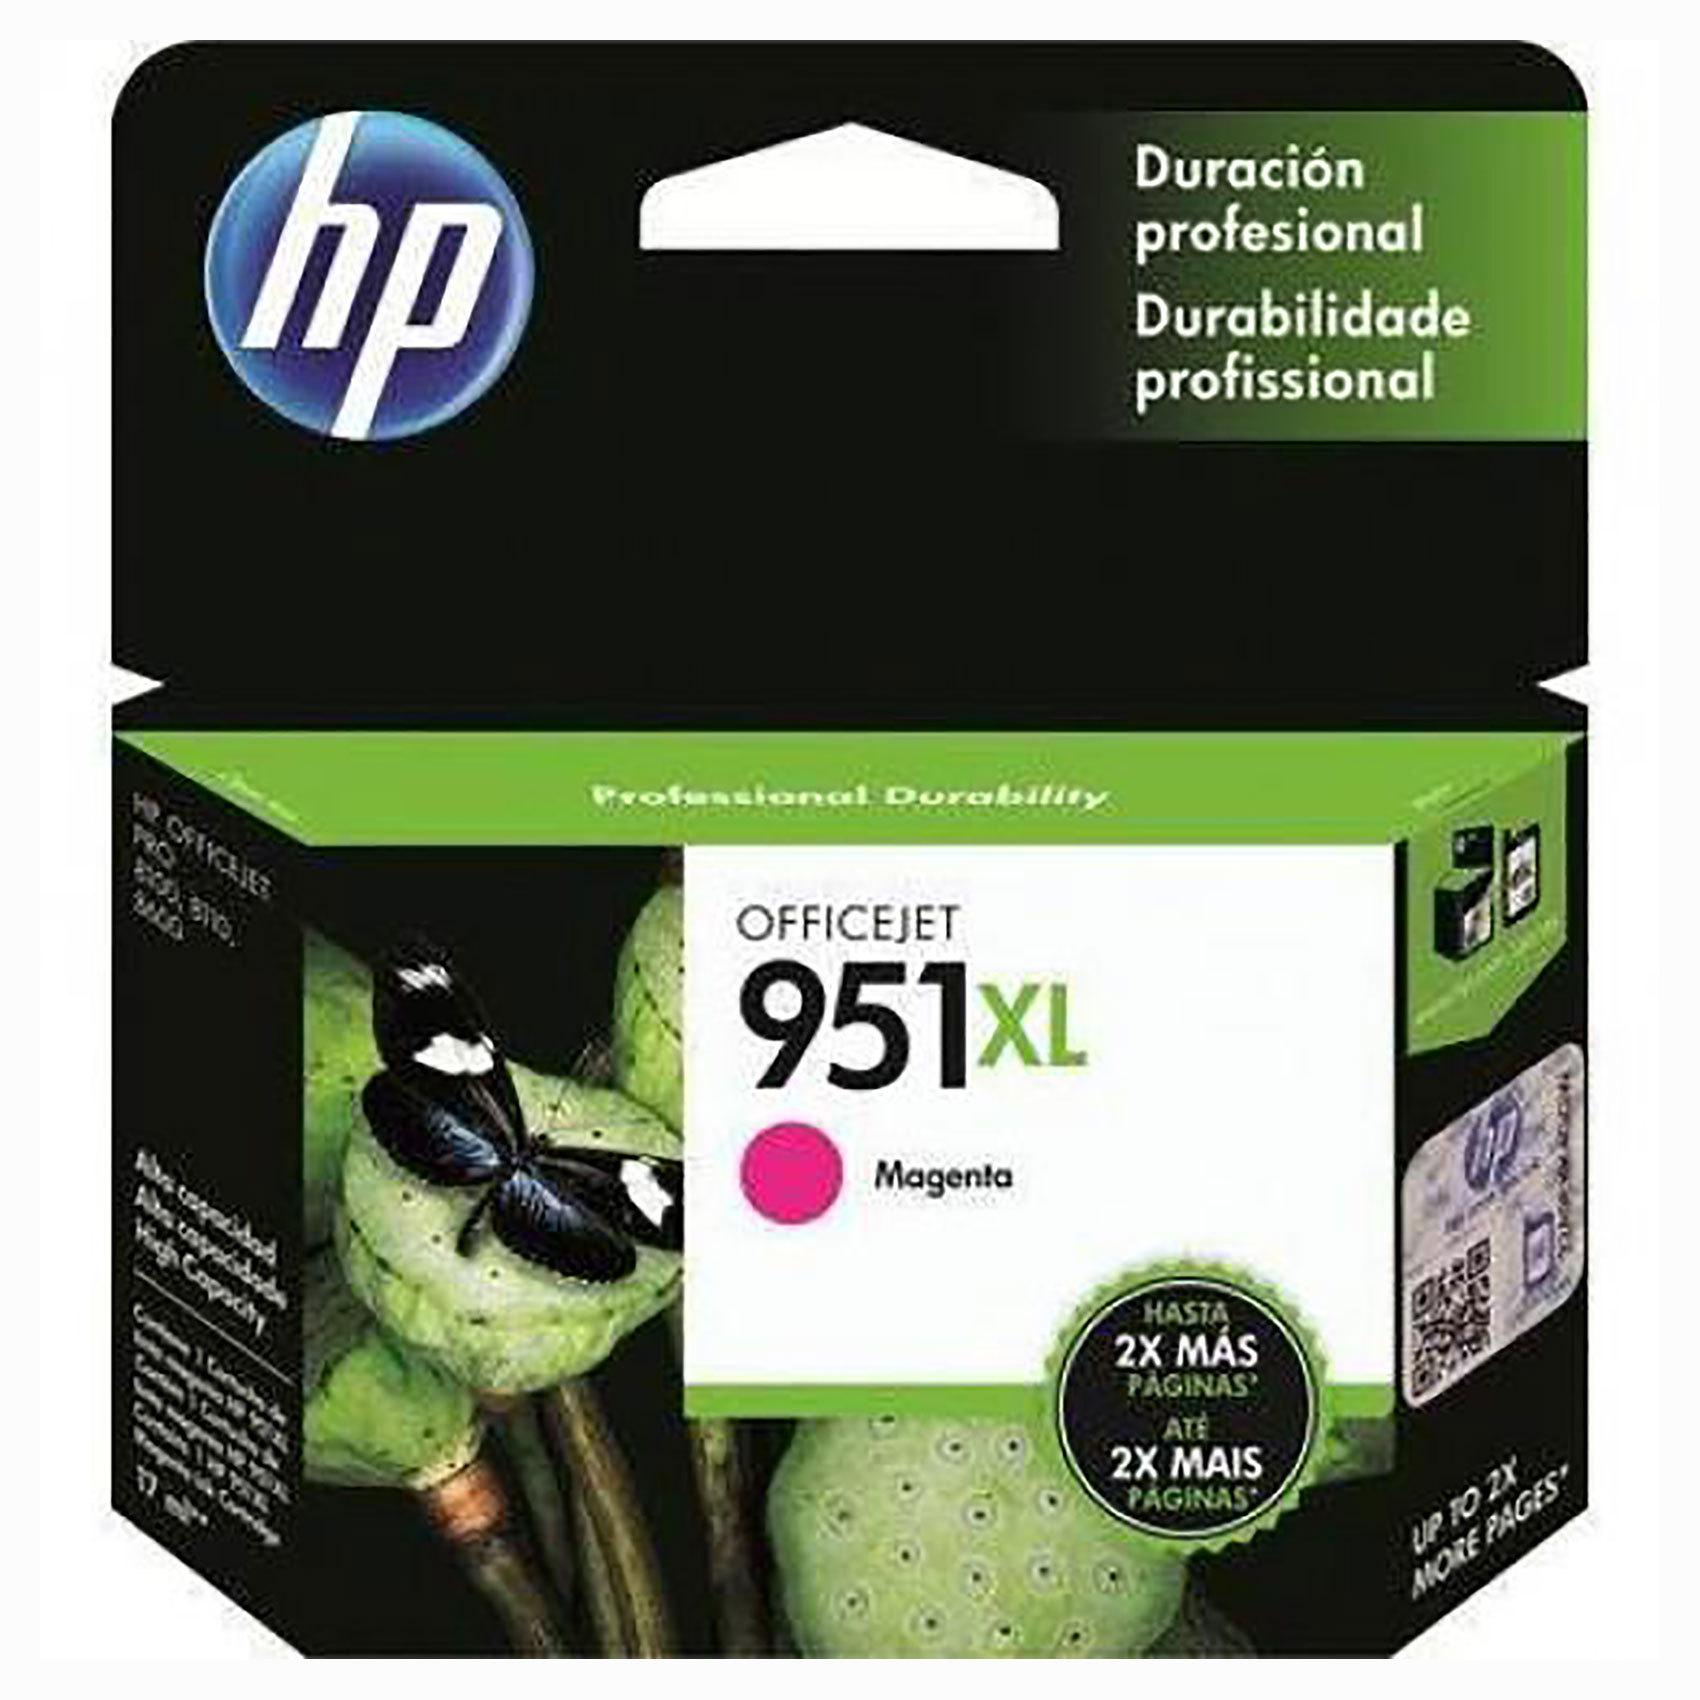 HP CART 951XL MAGENTA